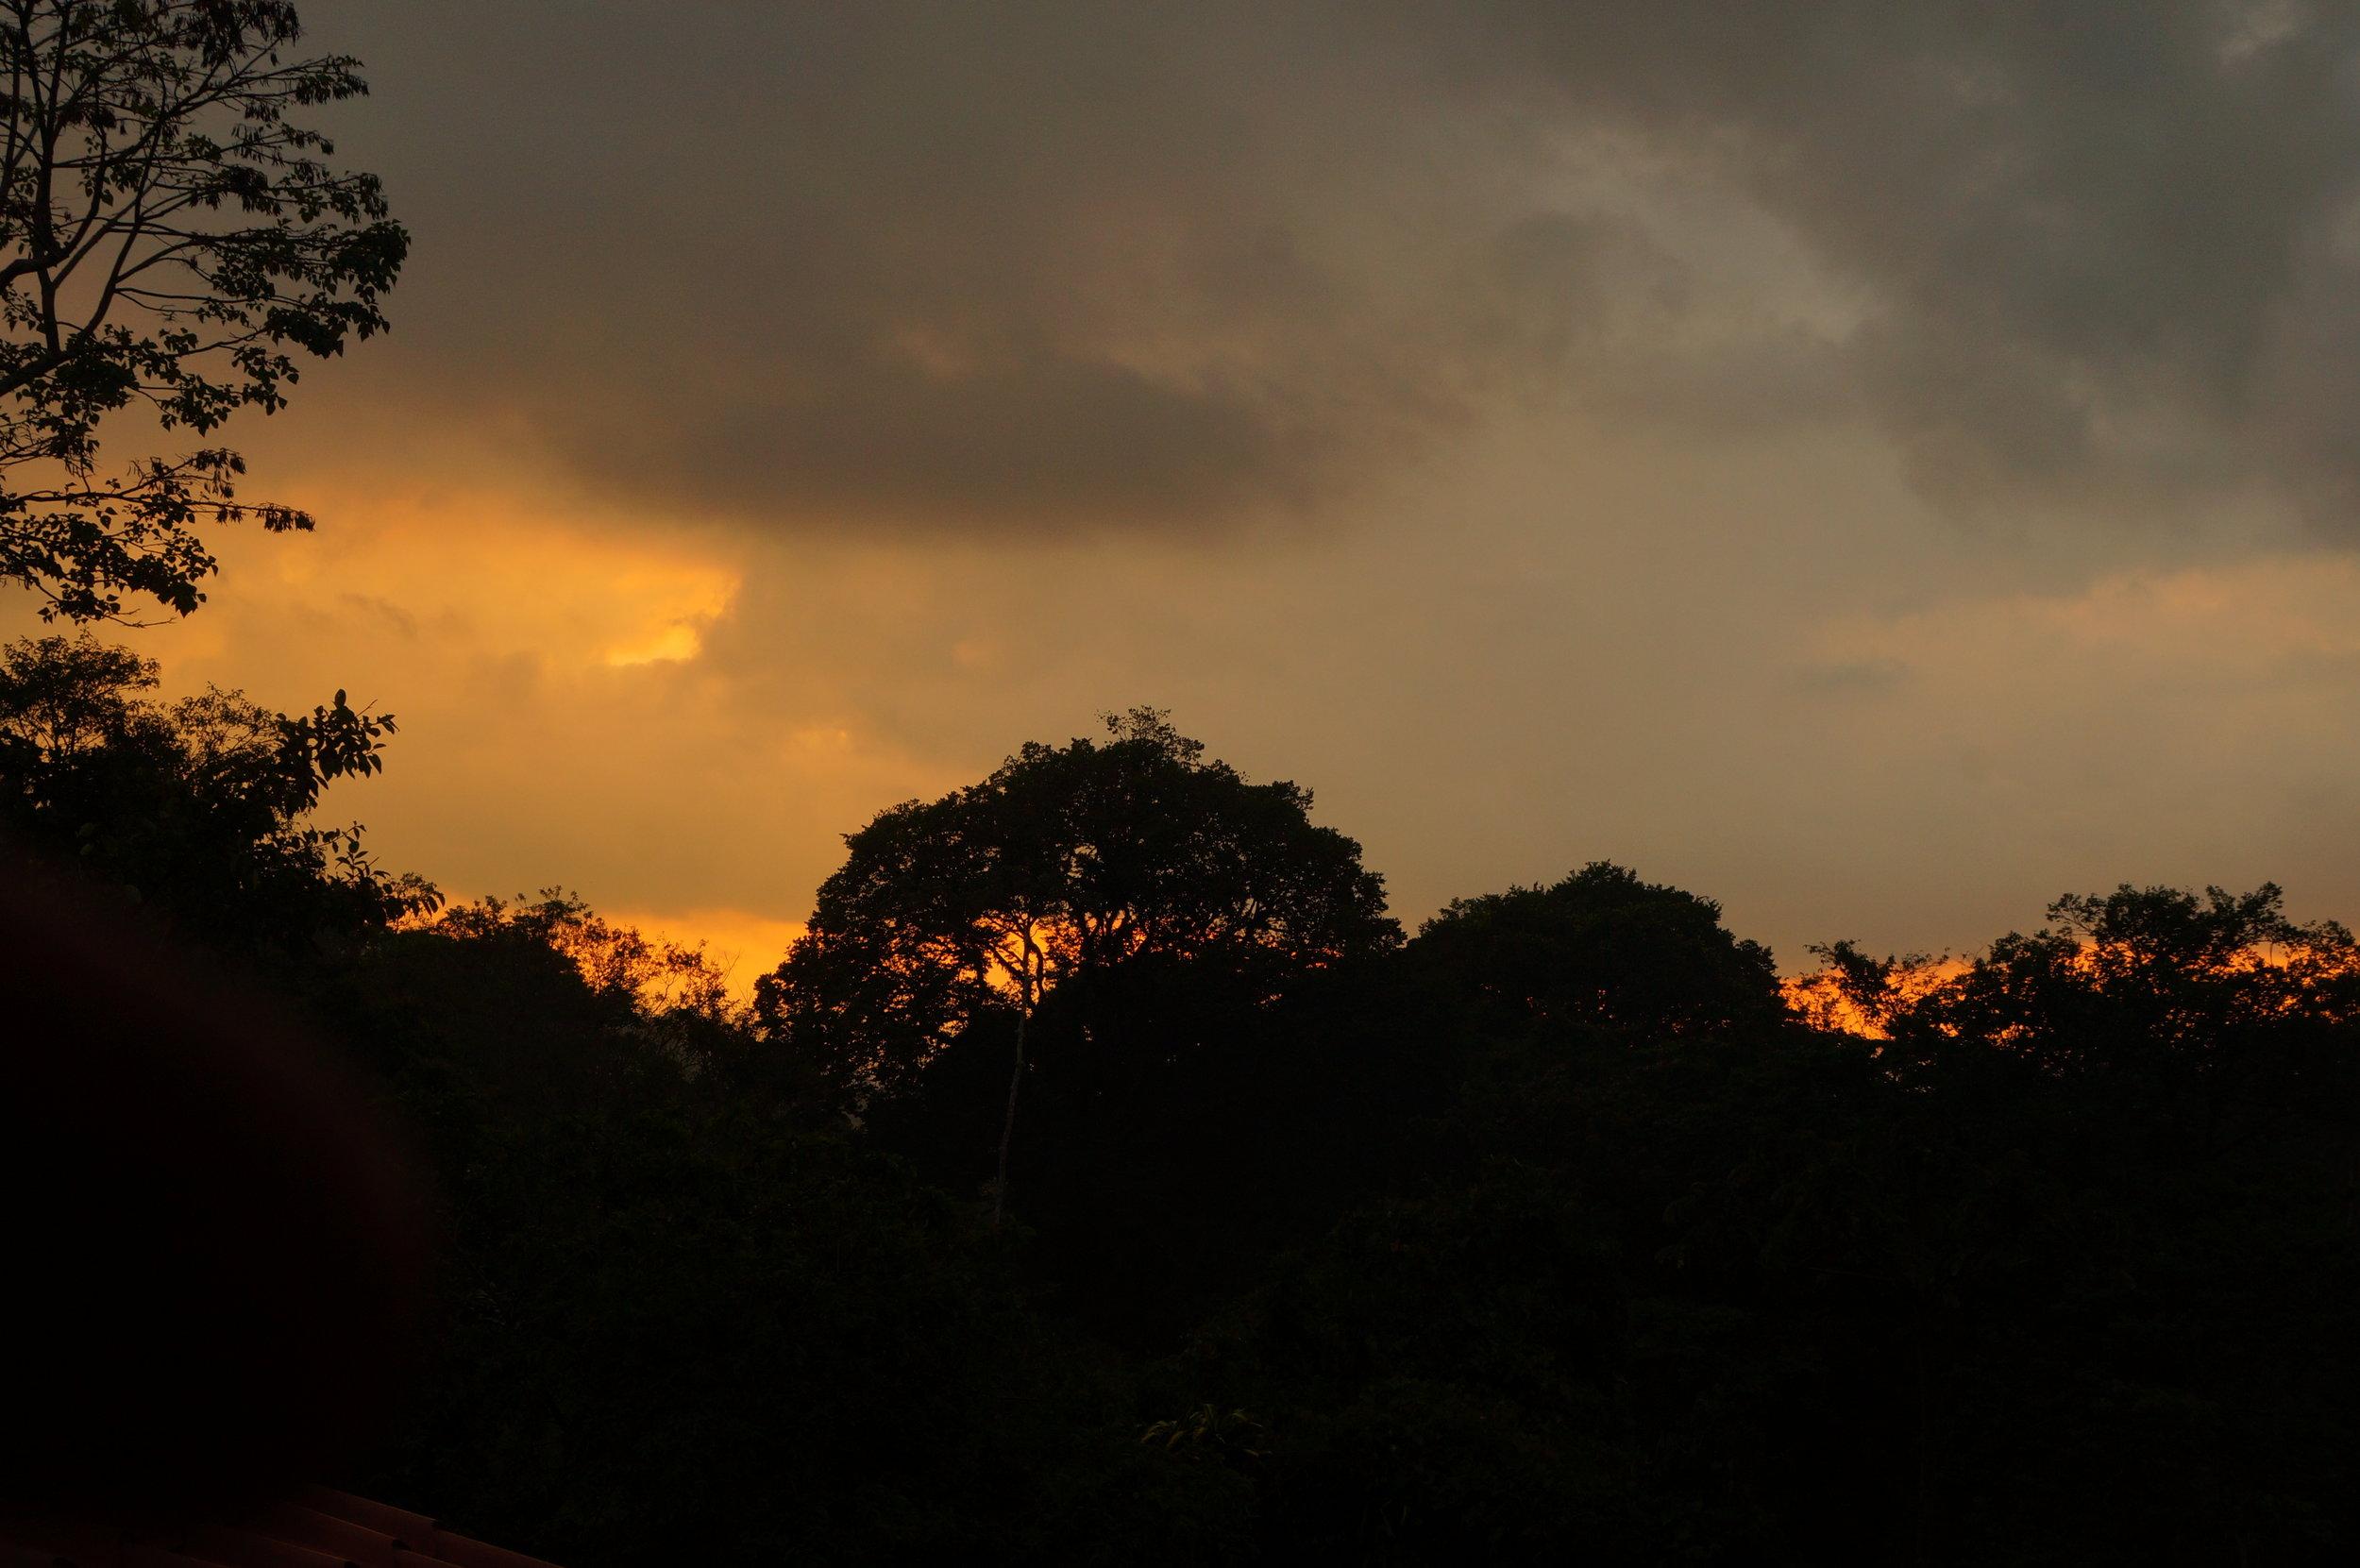 Sun setting over the mountains, in San Jose Costa Rica